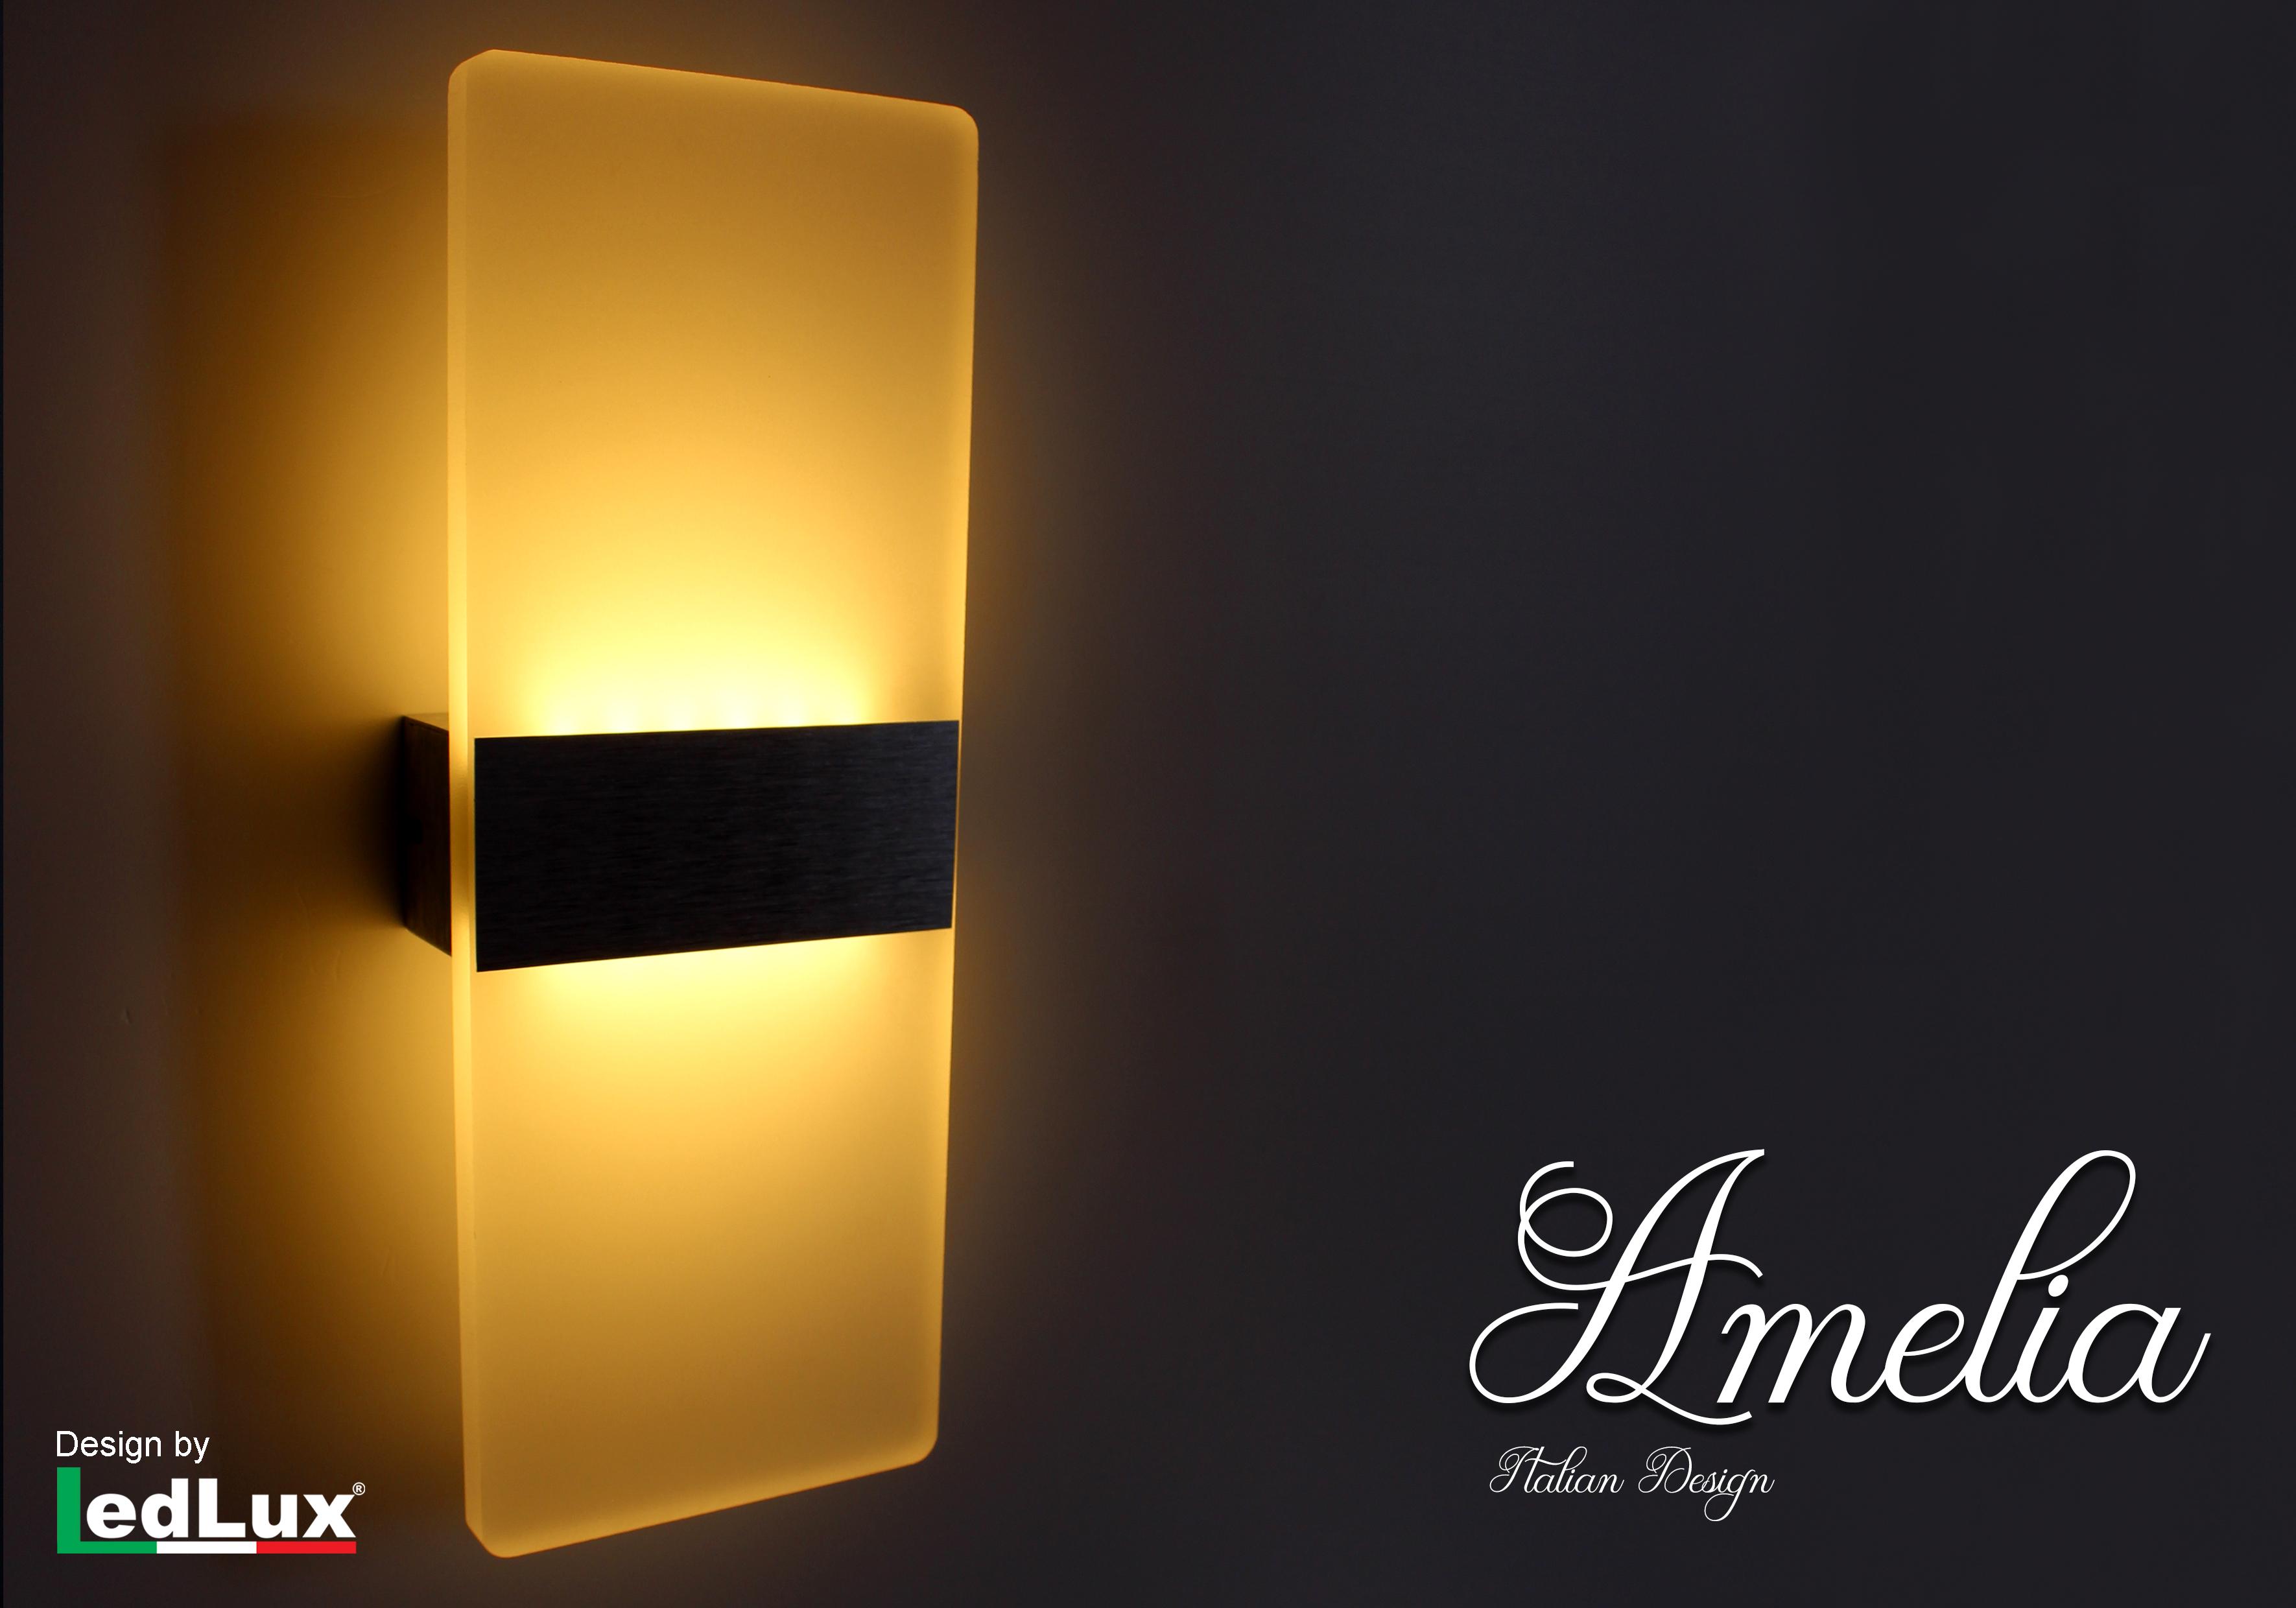 Ledlux applique led da parete modello amelia italian design